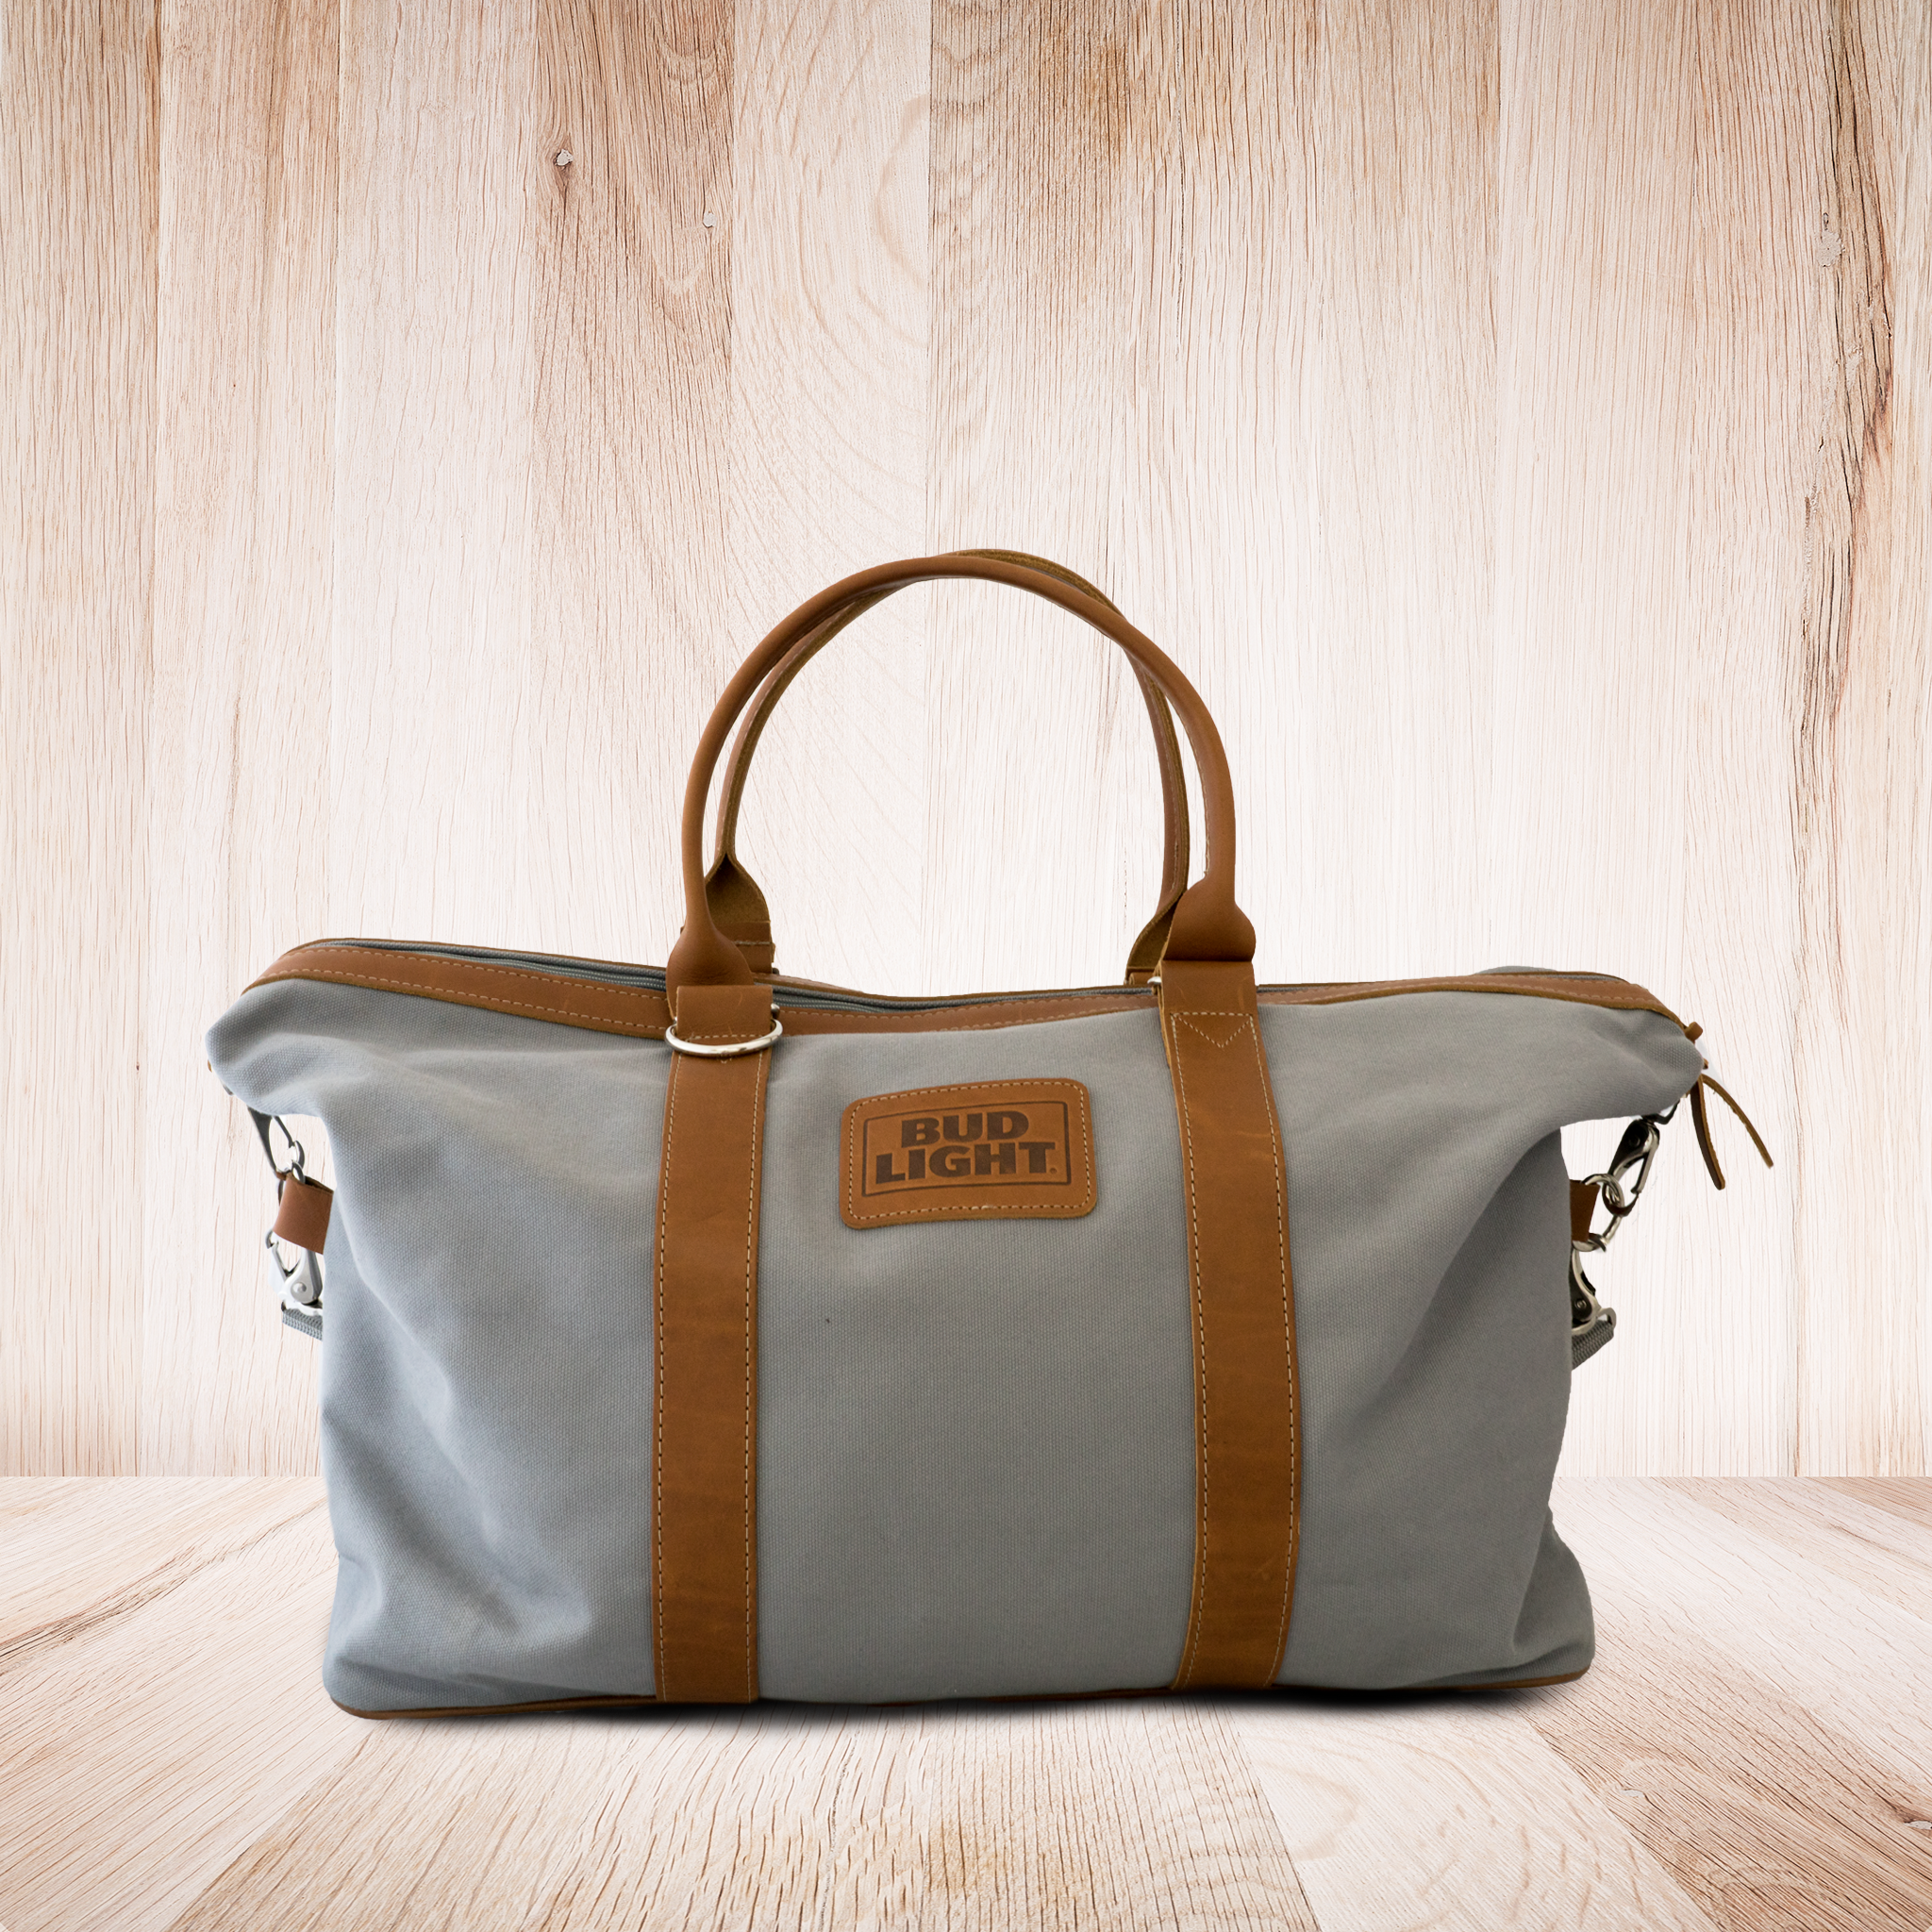 Bud Light Canvas Traveler Bag